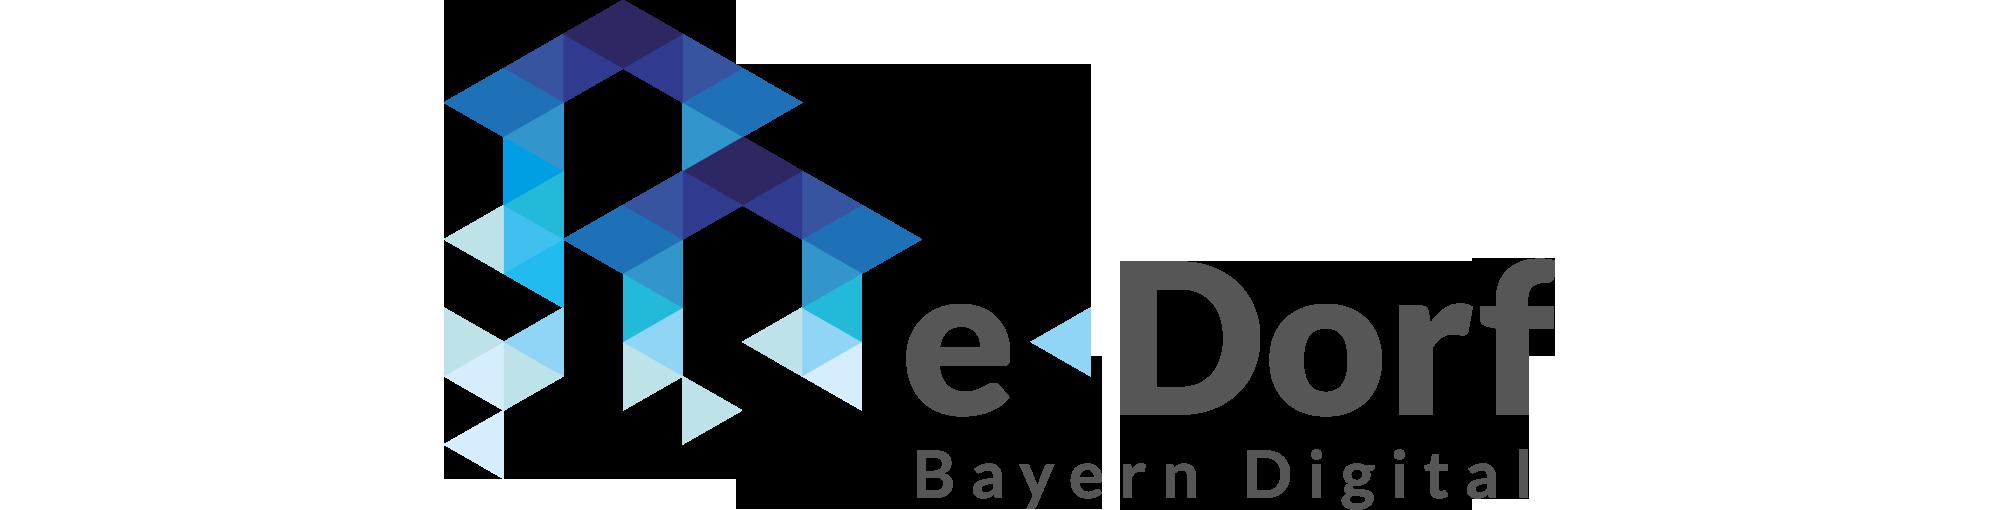 eDorf_Logo